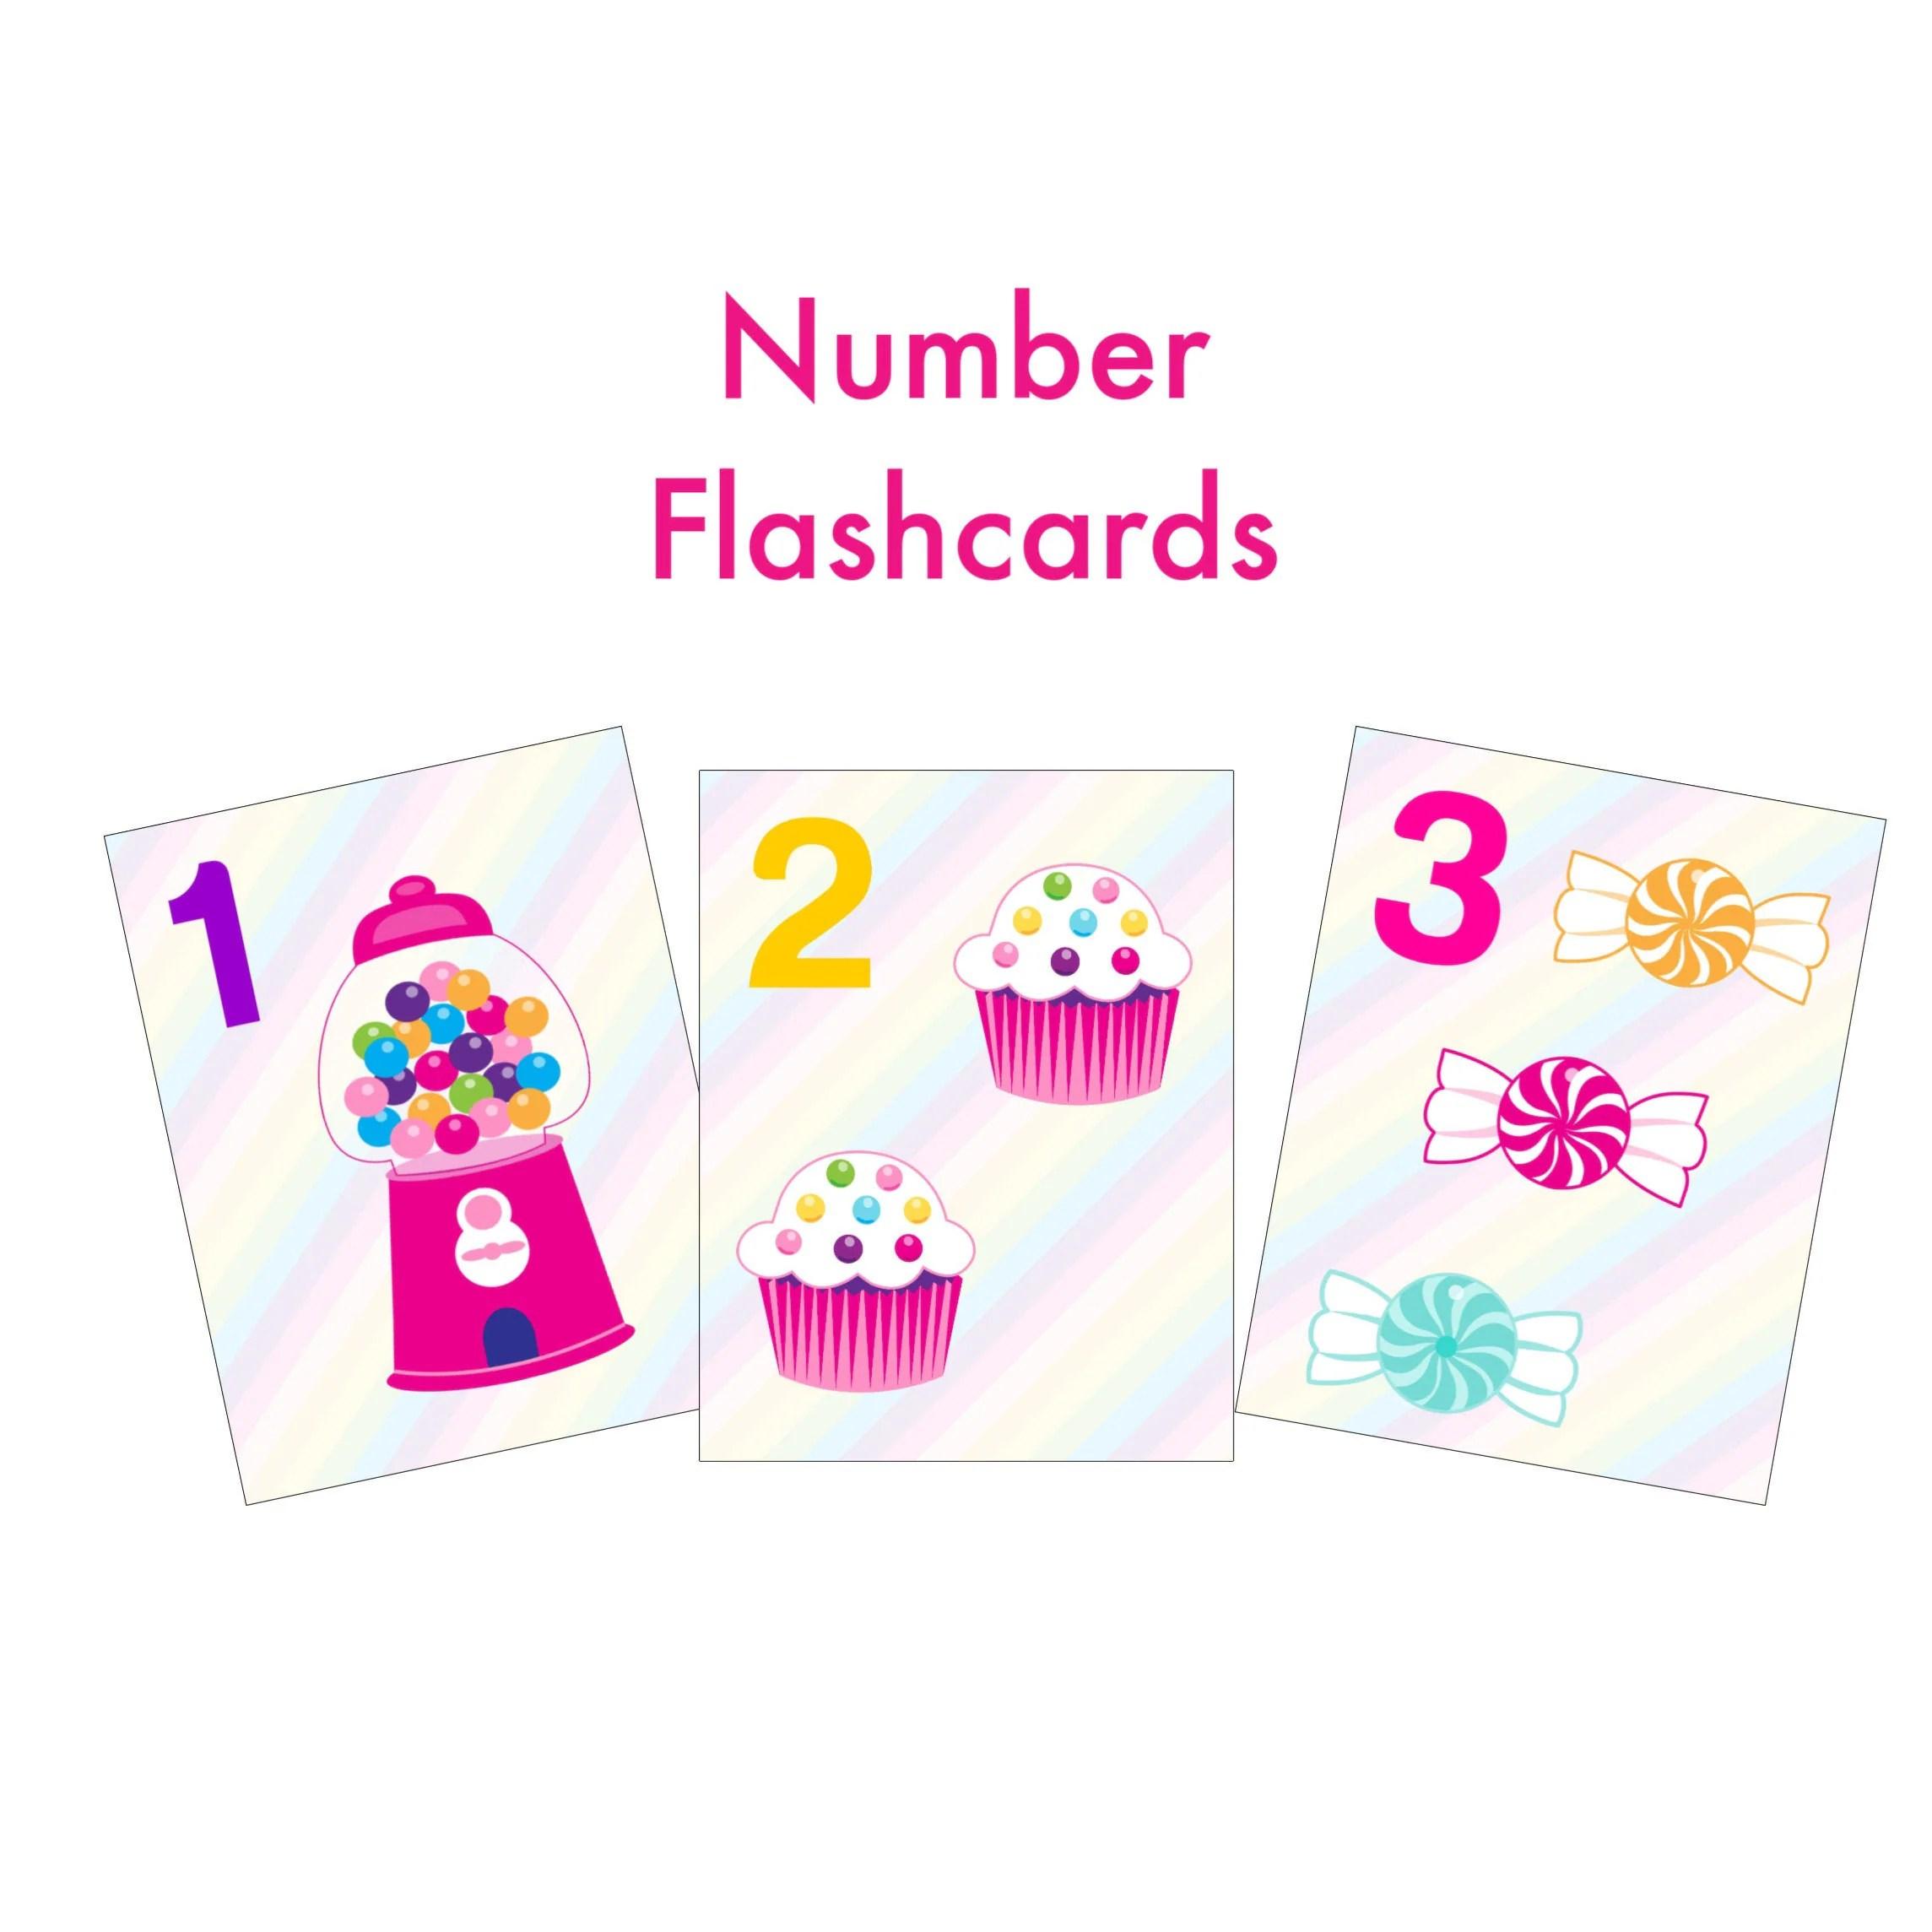 Candy Number Flashcards Preschool Learning Homeschool